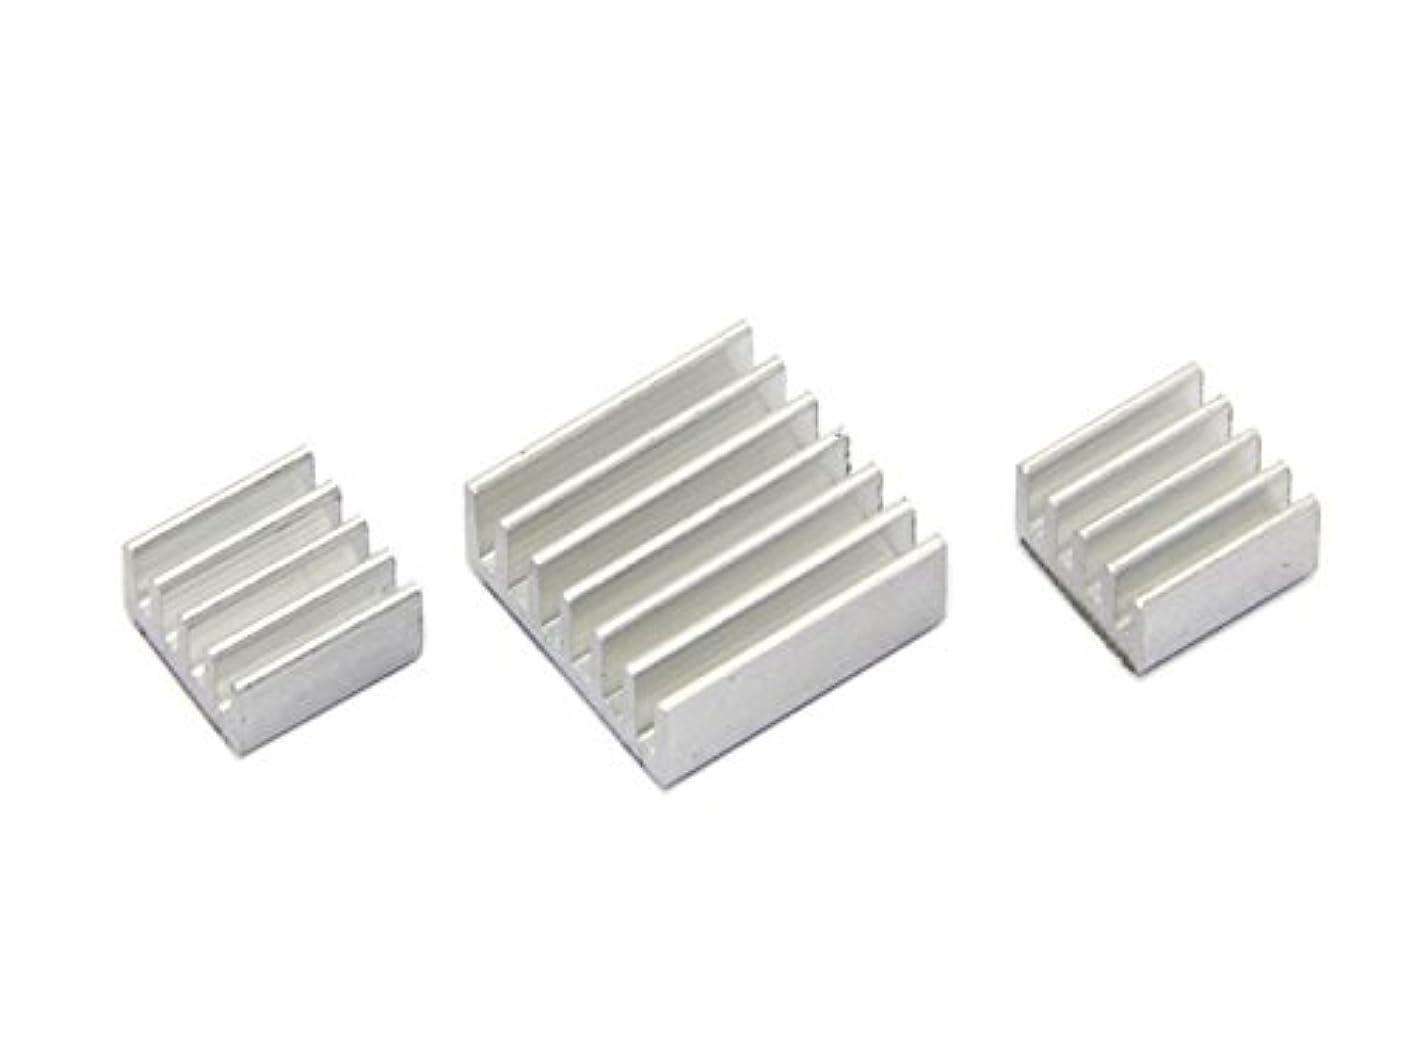 Games&Tech 3 Pieces Set Adhesive Aluminum Heatsink Cooler Cooling Kit for Raspberry Pi A A+ B B+ 2 Model B